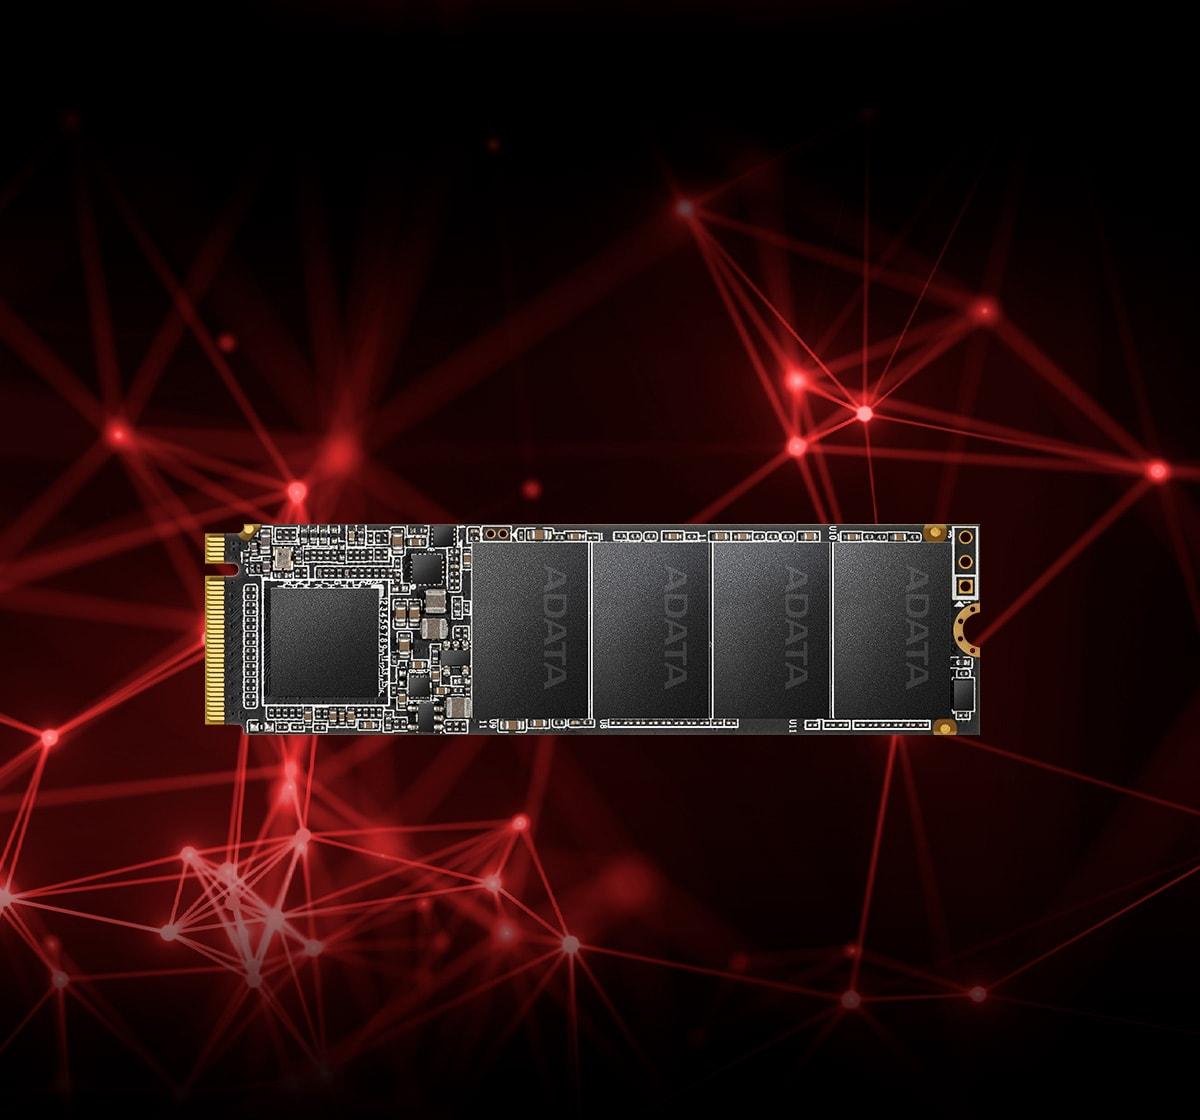 اس اس دی اینترنال ایکس پی جی مدل SX6000 Pro PCIe Gen3x4 M.2 2280